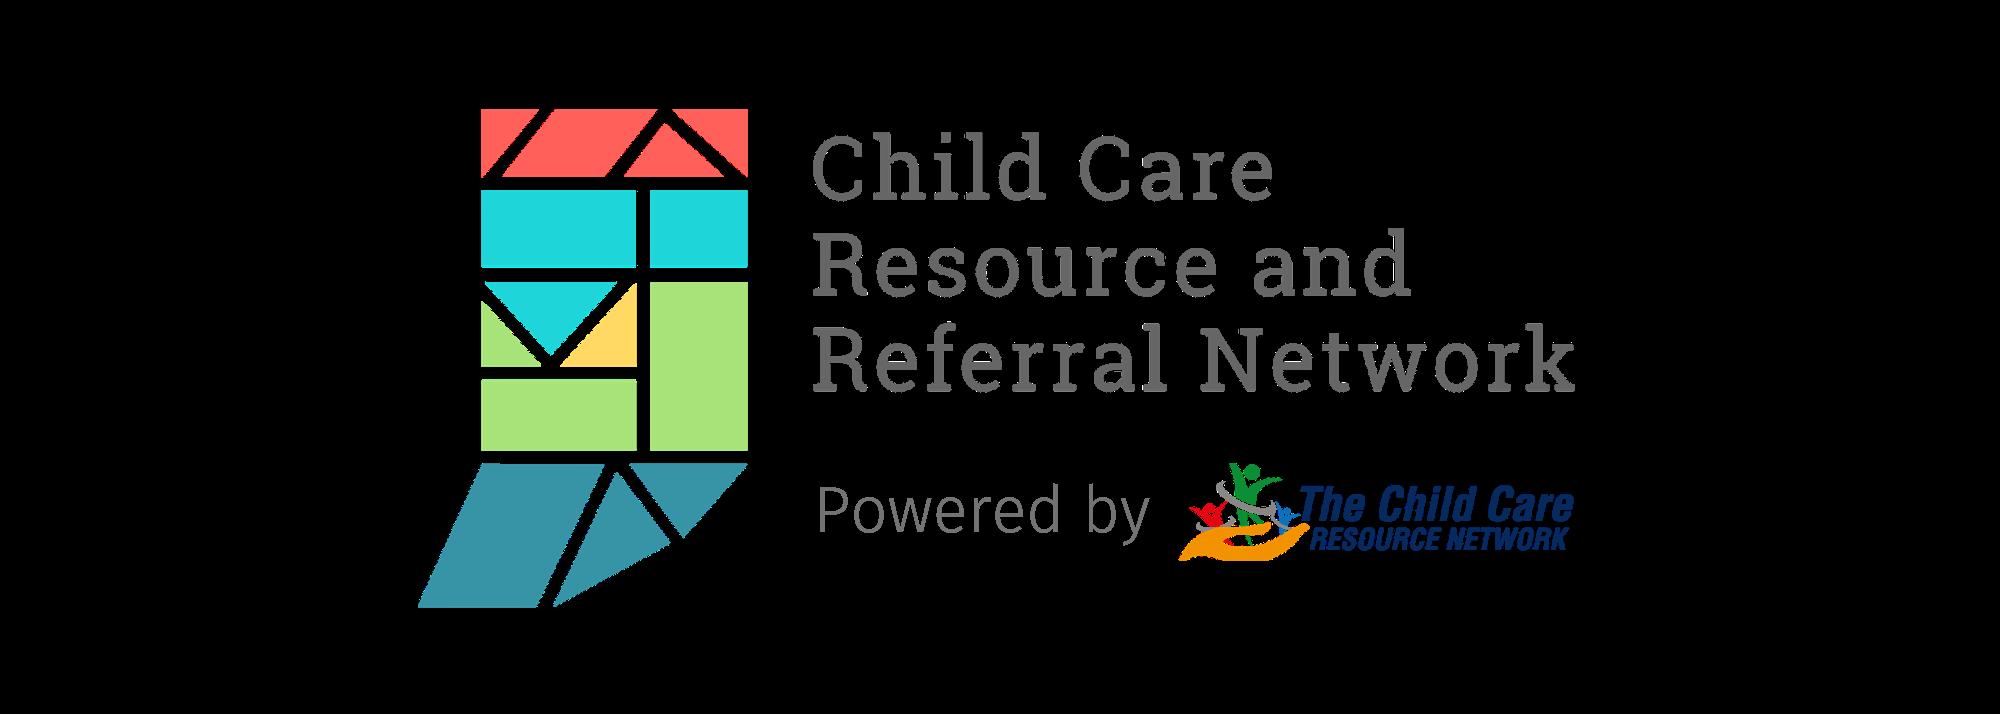 SDA 2 - The Child Care Resource Network